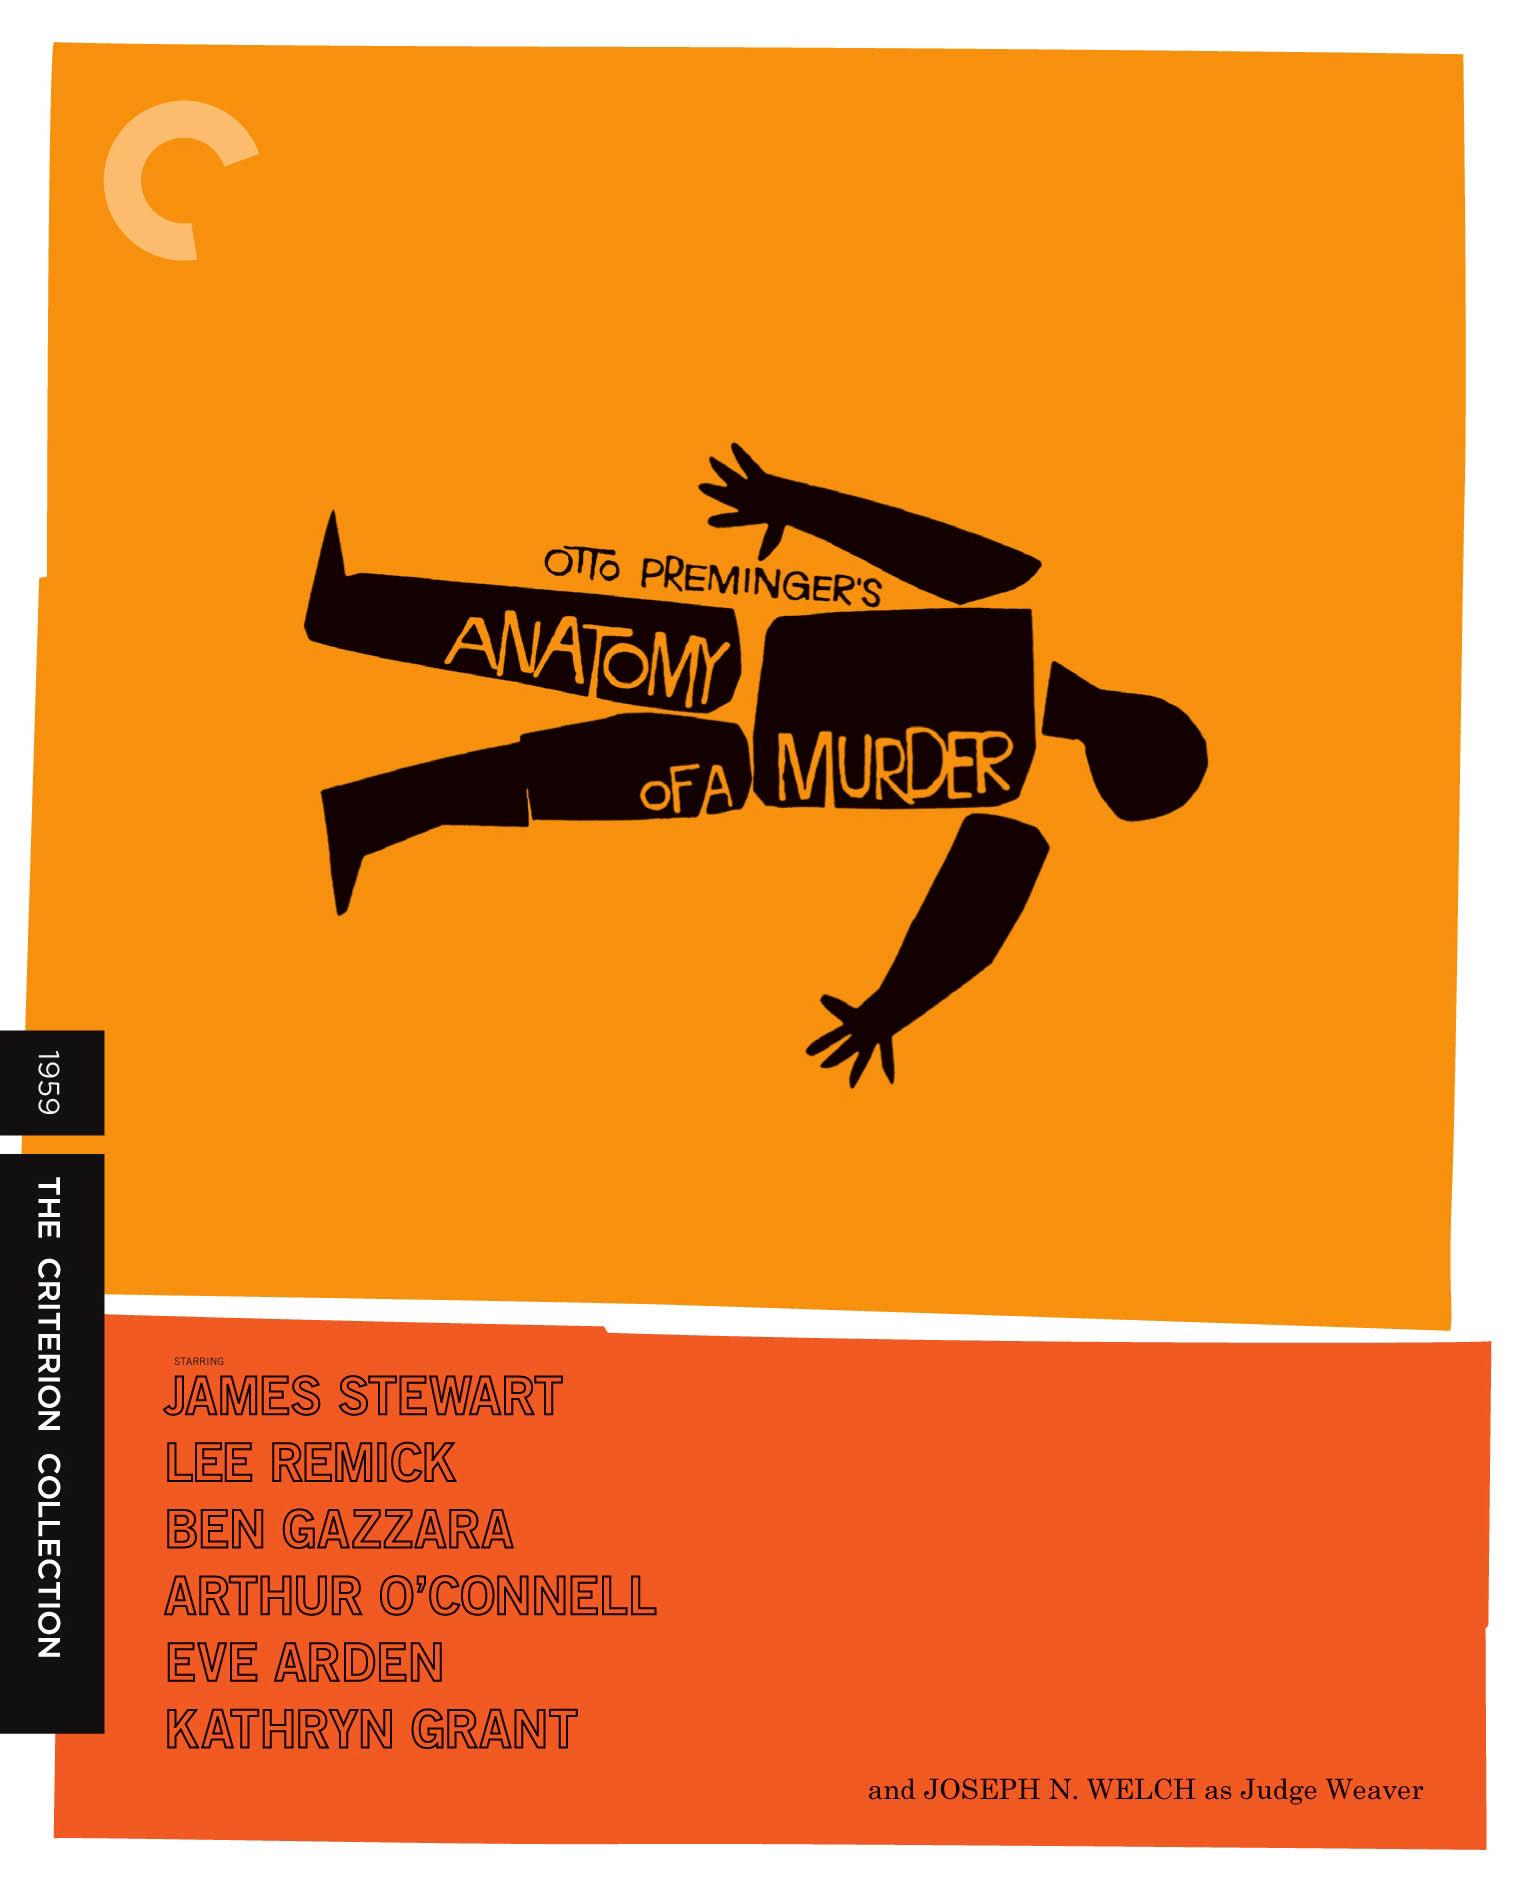 Buy PRE-ORDER Anatomy of a Murder (Blu-ray)